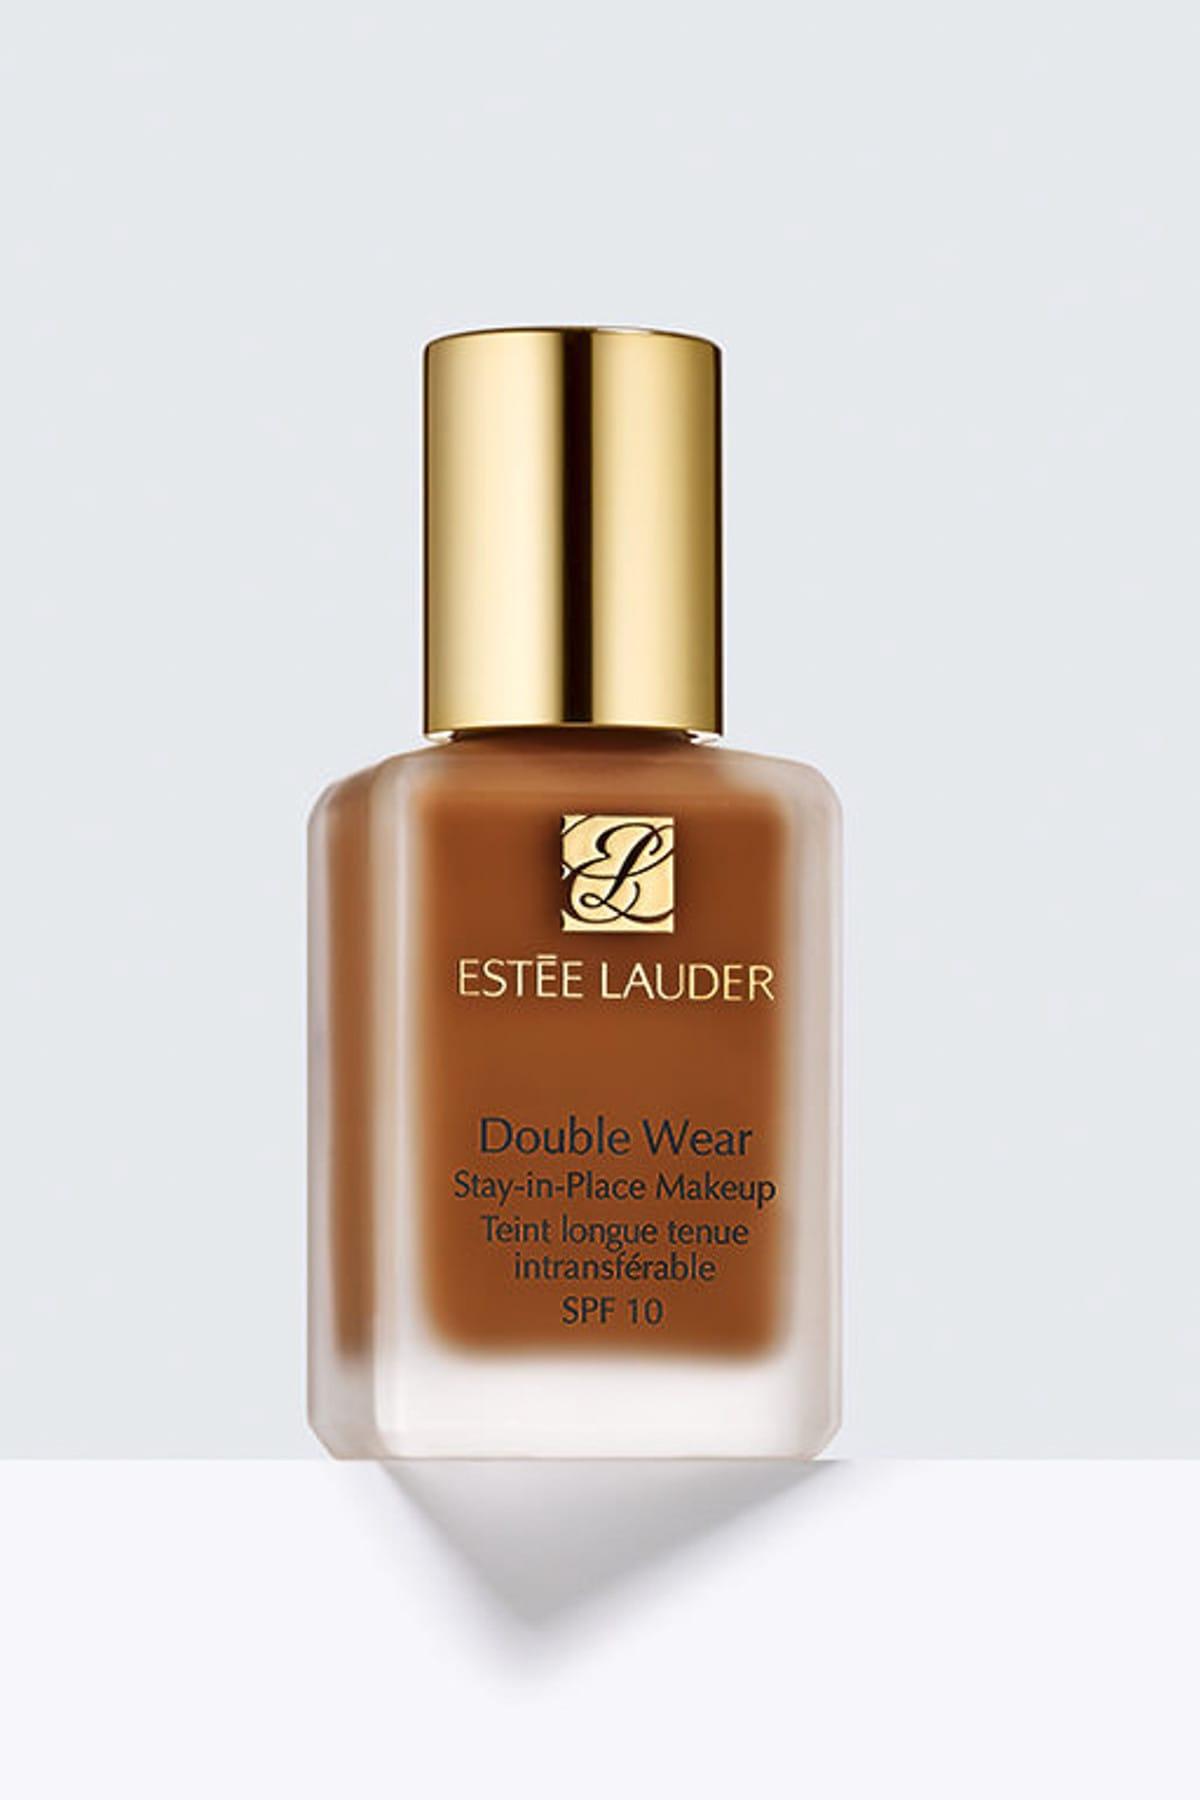 Estee Lauder Fondöten - Double Wear Foundation S.I.P Spf10 6C1 Rich Cocoa30 ml027131830788 1